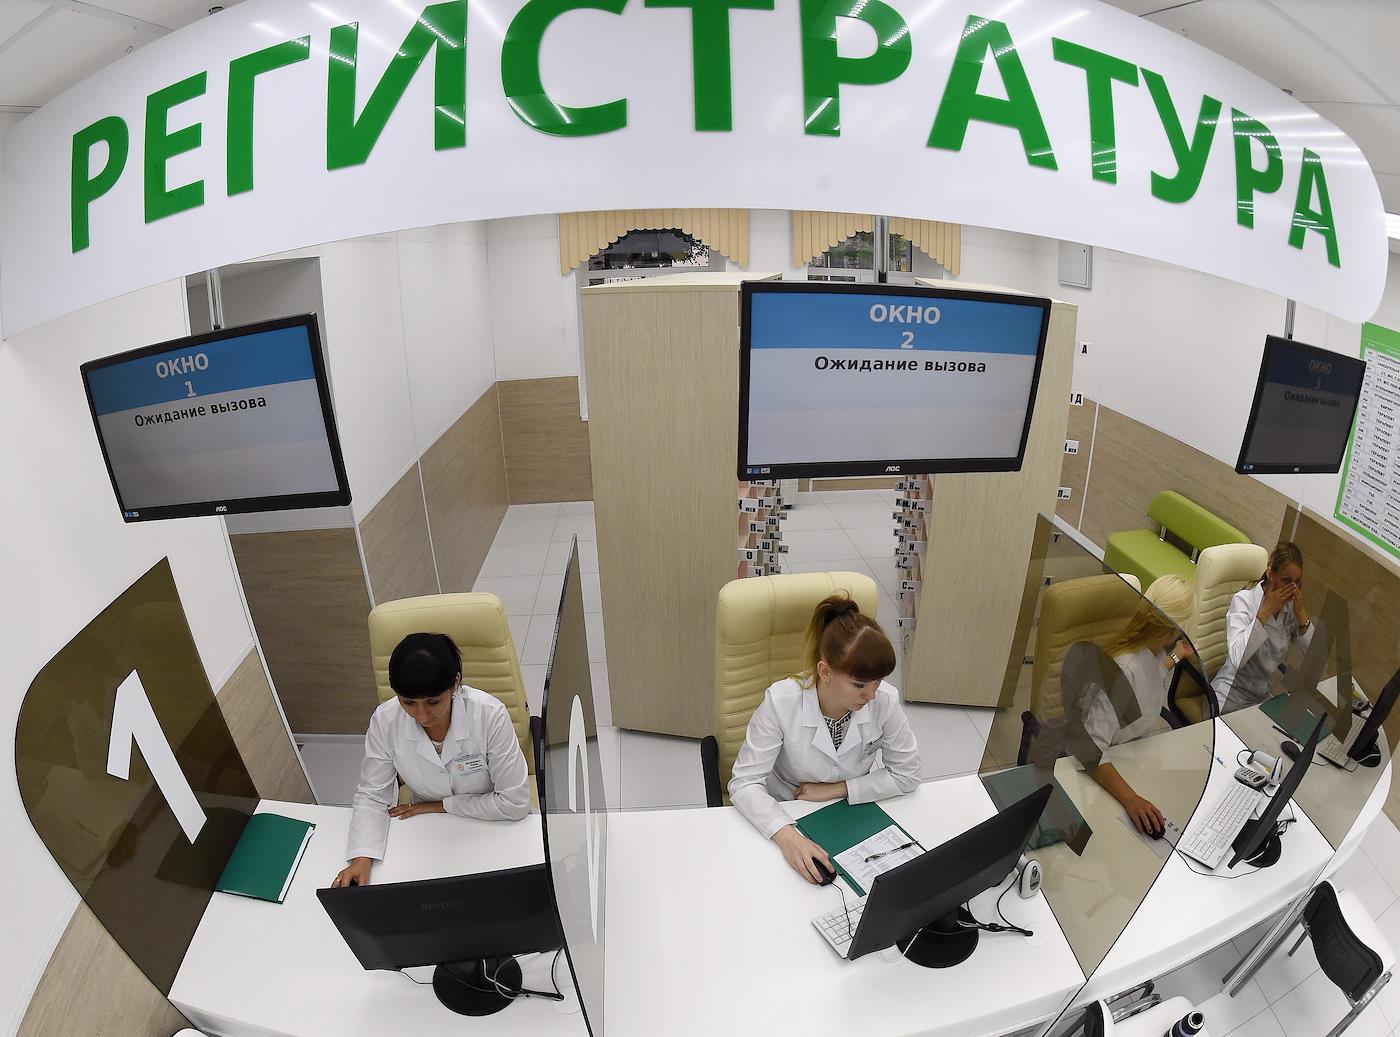 автор фото Анатолий Жданов/«Коммерсантъ»